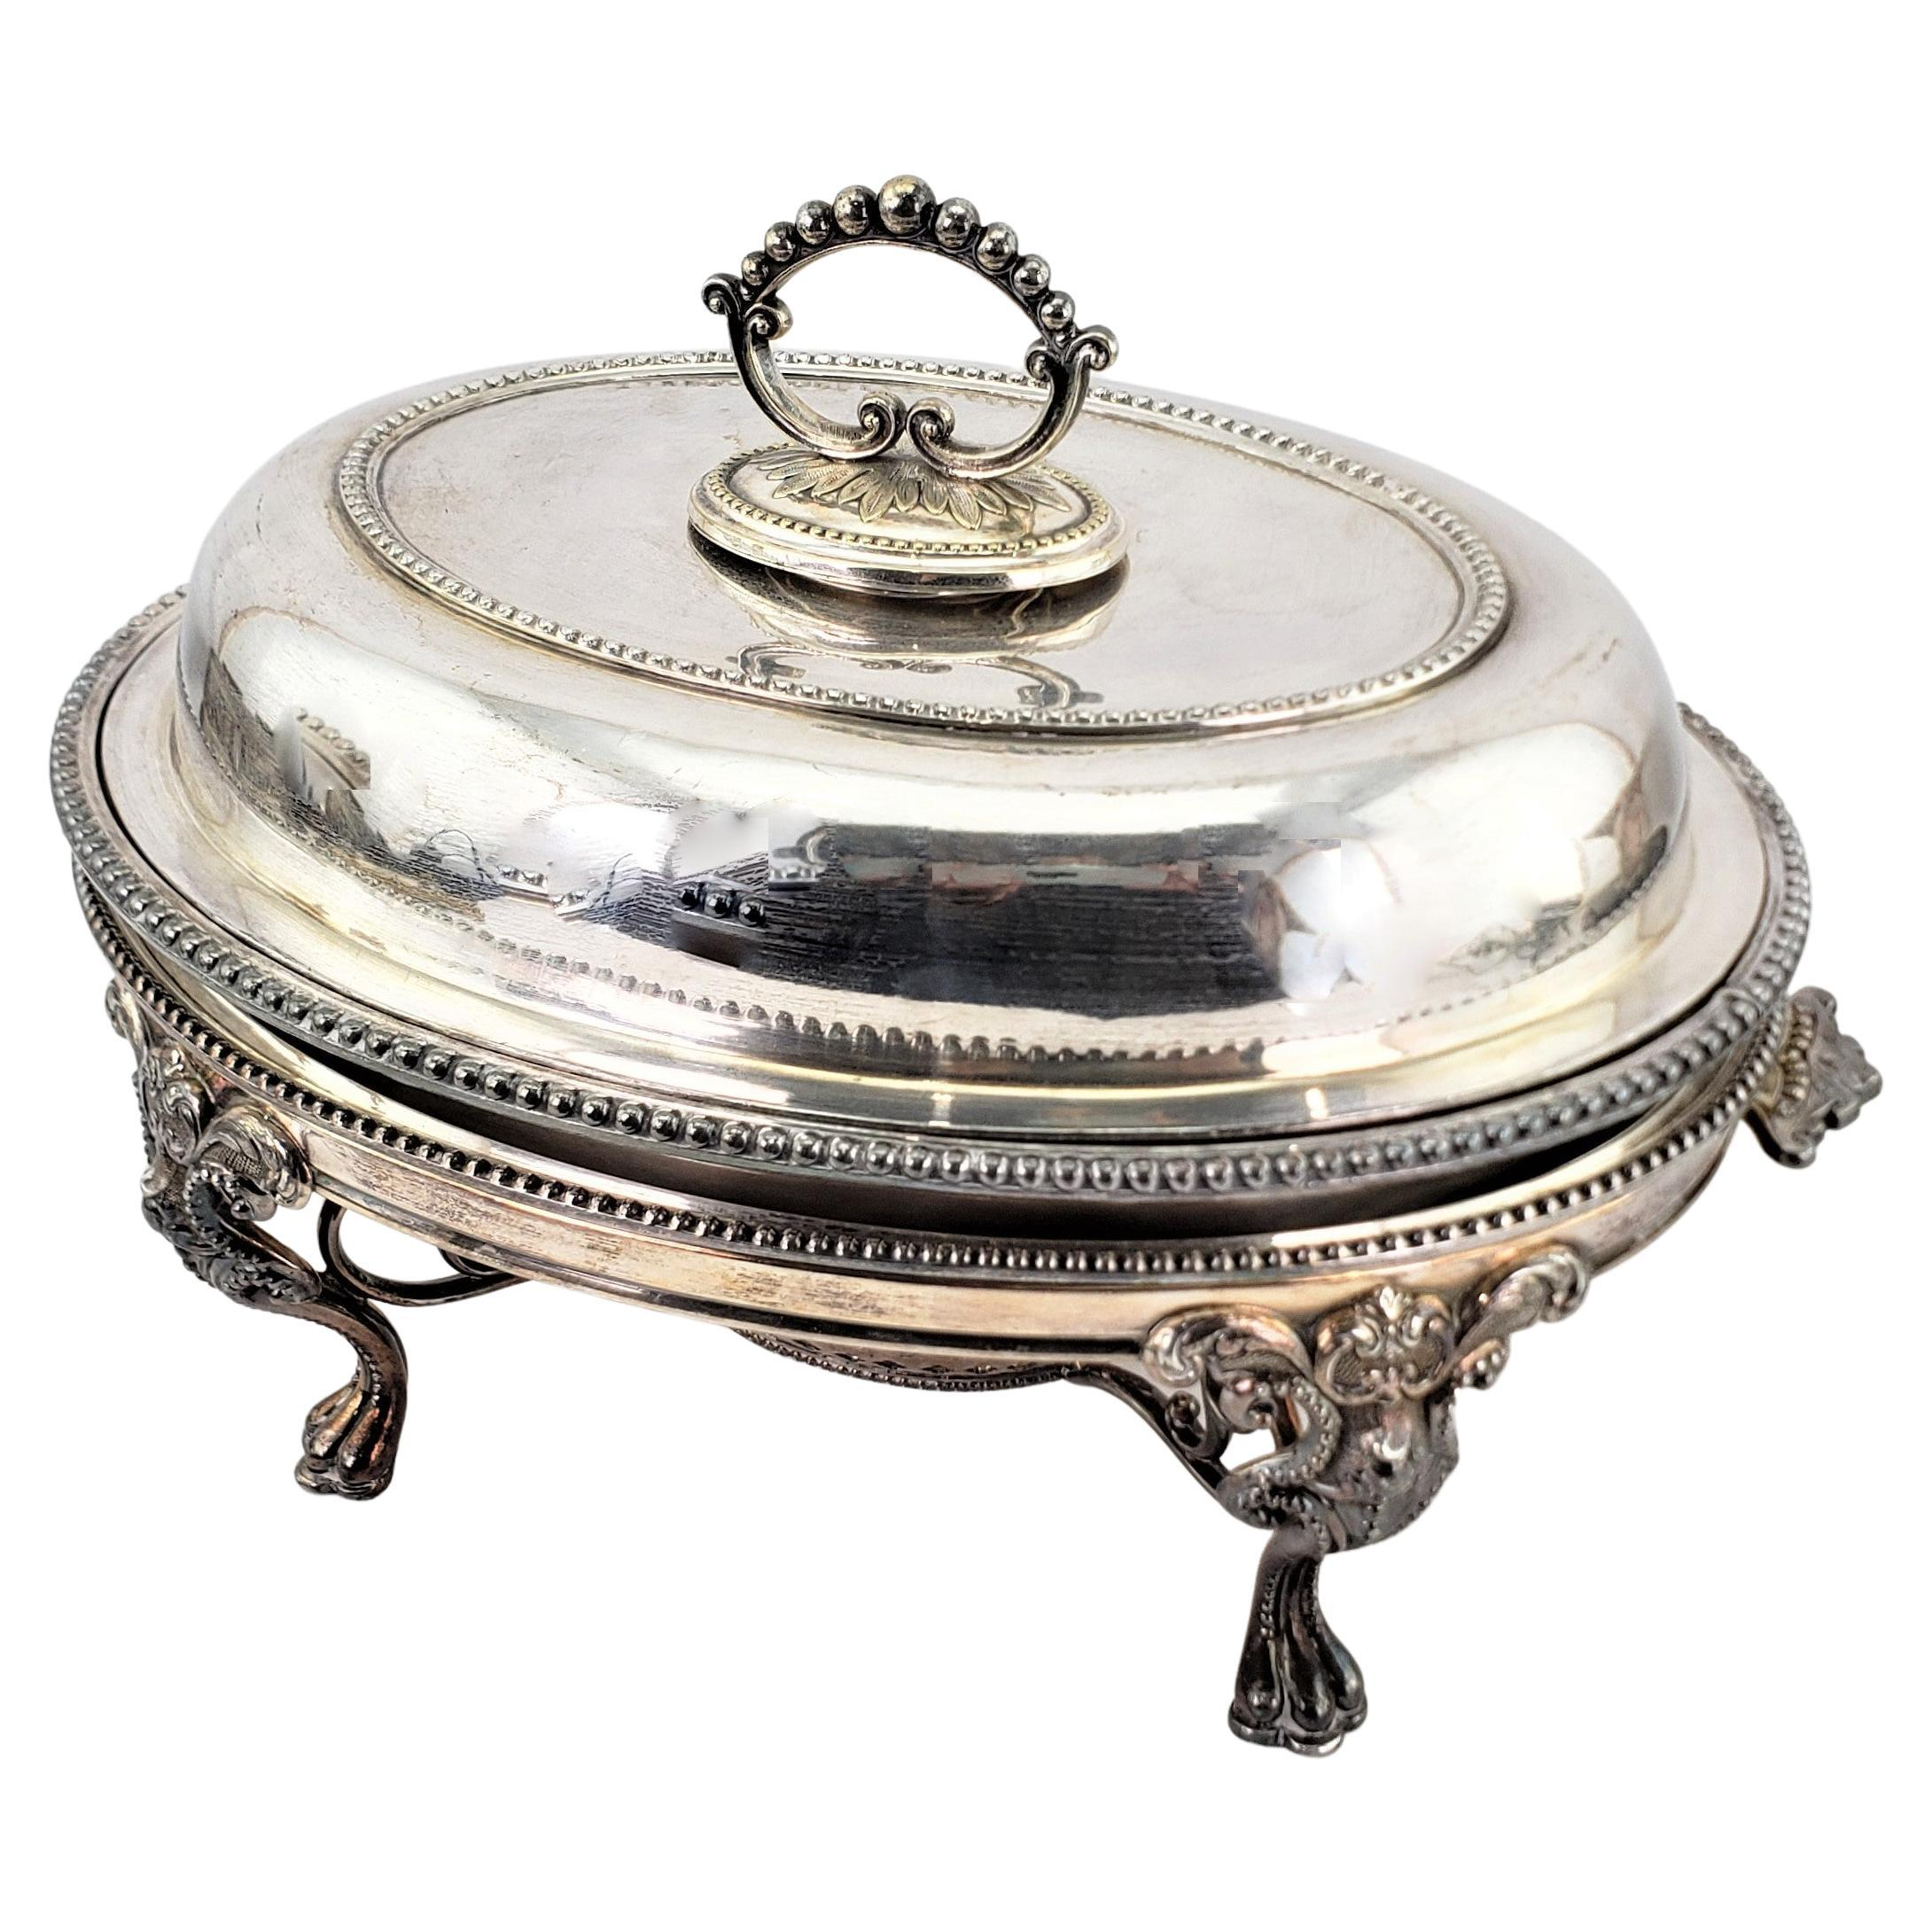 Reed & Barton Platters and Serveware